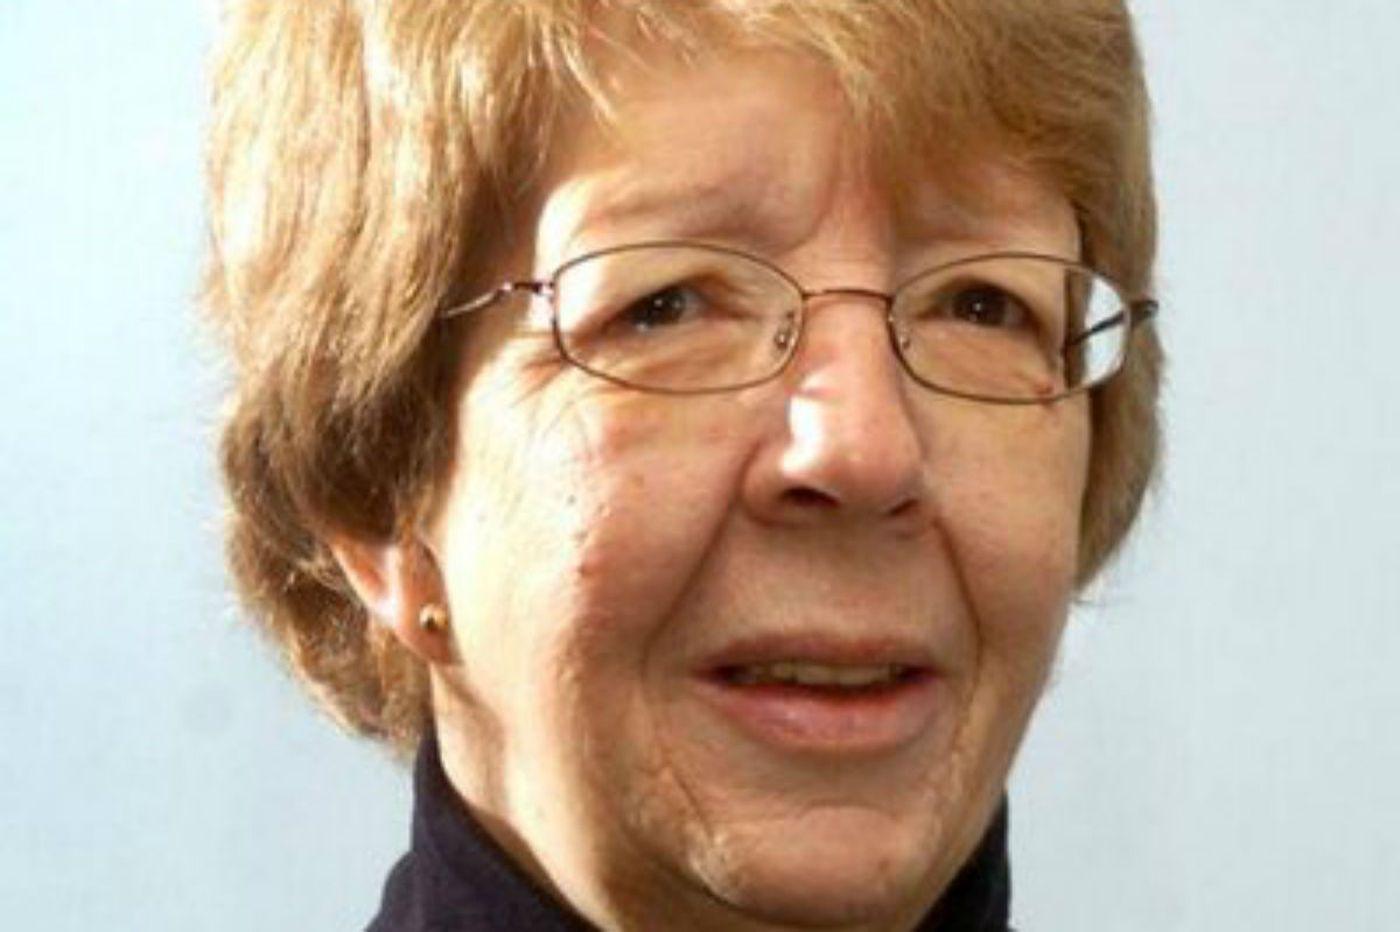 Margaret 'Peg' Gibbons, 69, veteran politics and government reporter